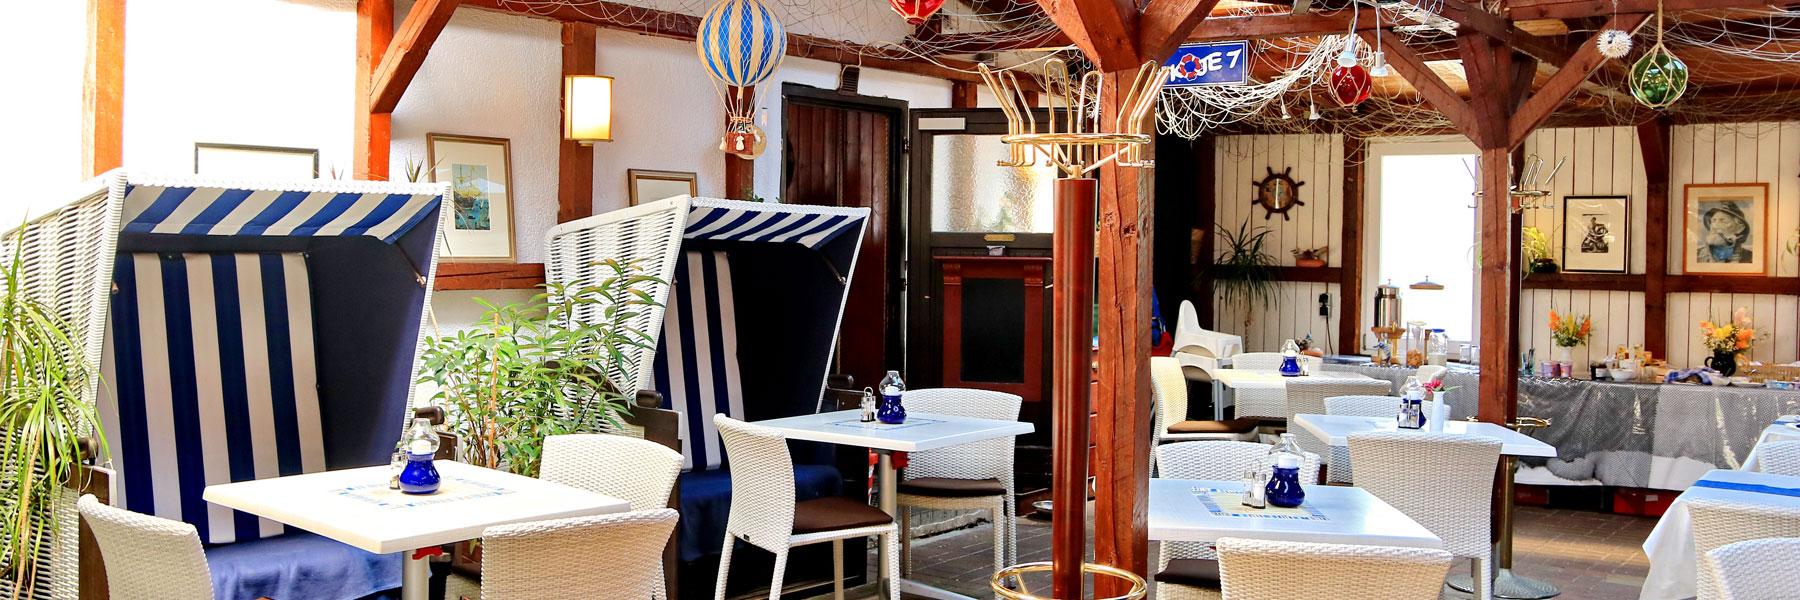 Gastraum - Ankes Restaurant & Pension